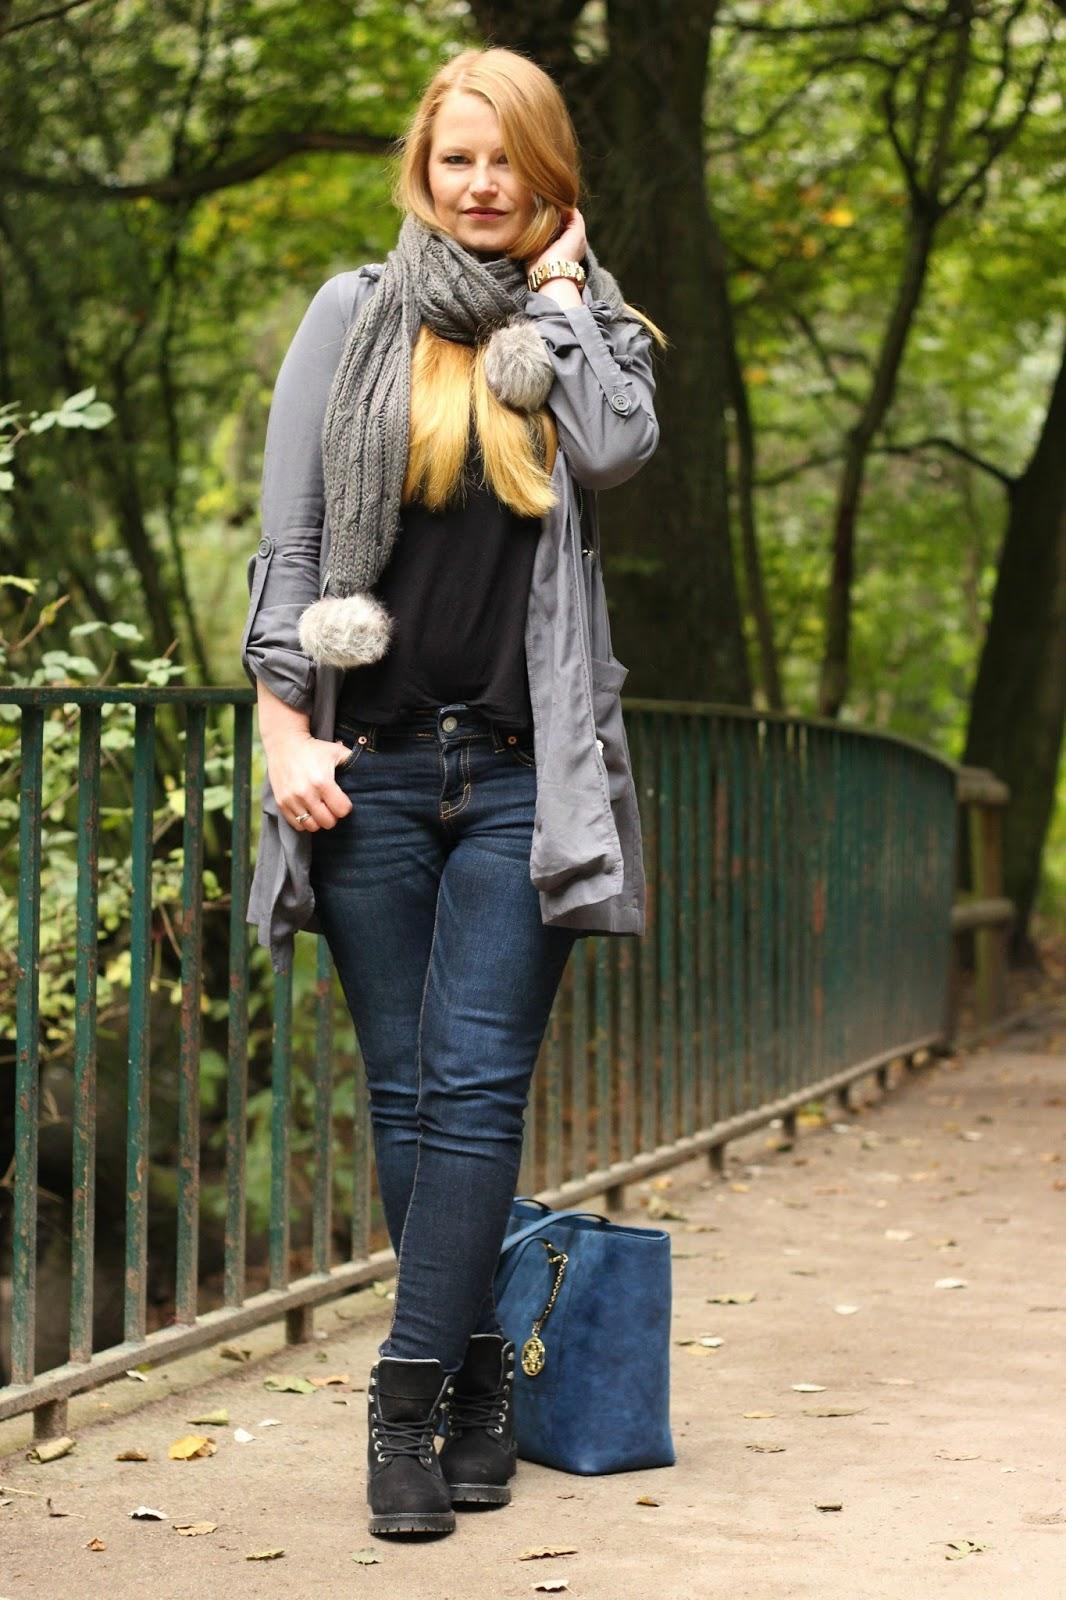 2016, blogparade, catser, damenschuhe, fashion, herbst, herbstliches outfit, leder, look, modetrends, outdoor, outfit, roland, schnürboots, schuhtrends, stiefelette, tamaris, tom tailor, winter, winterschuhe,